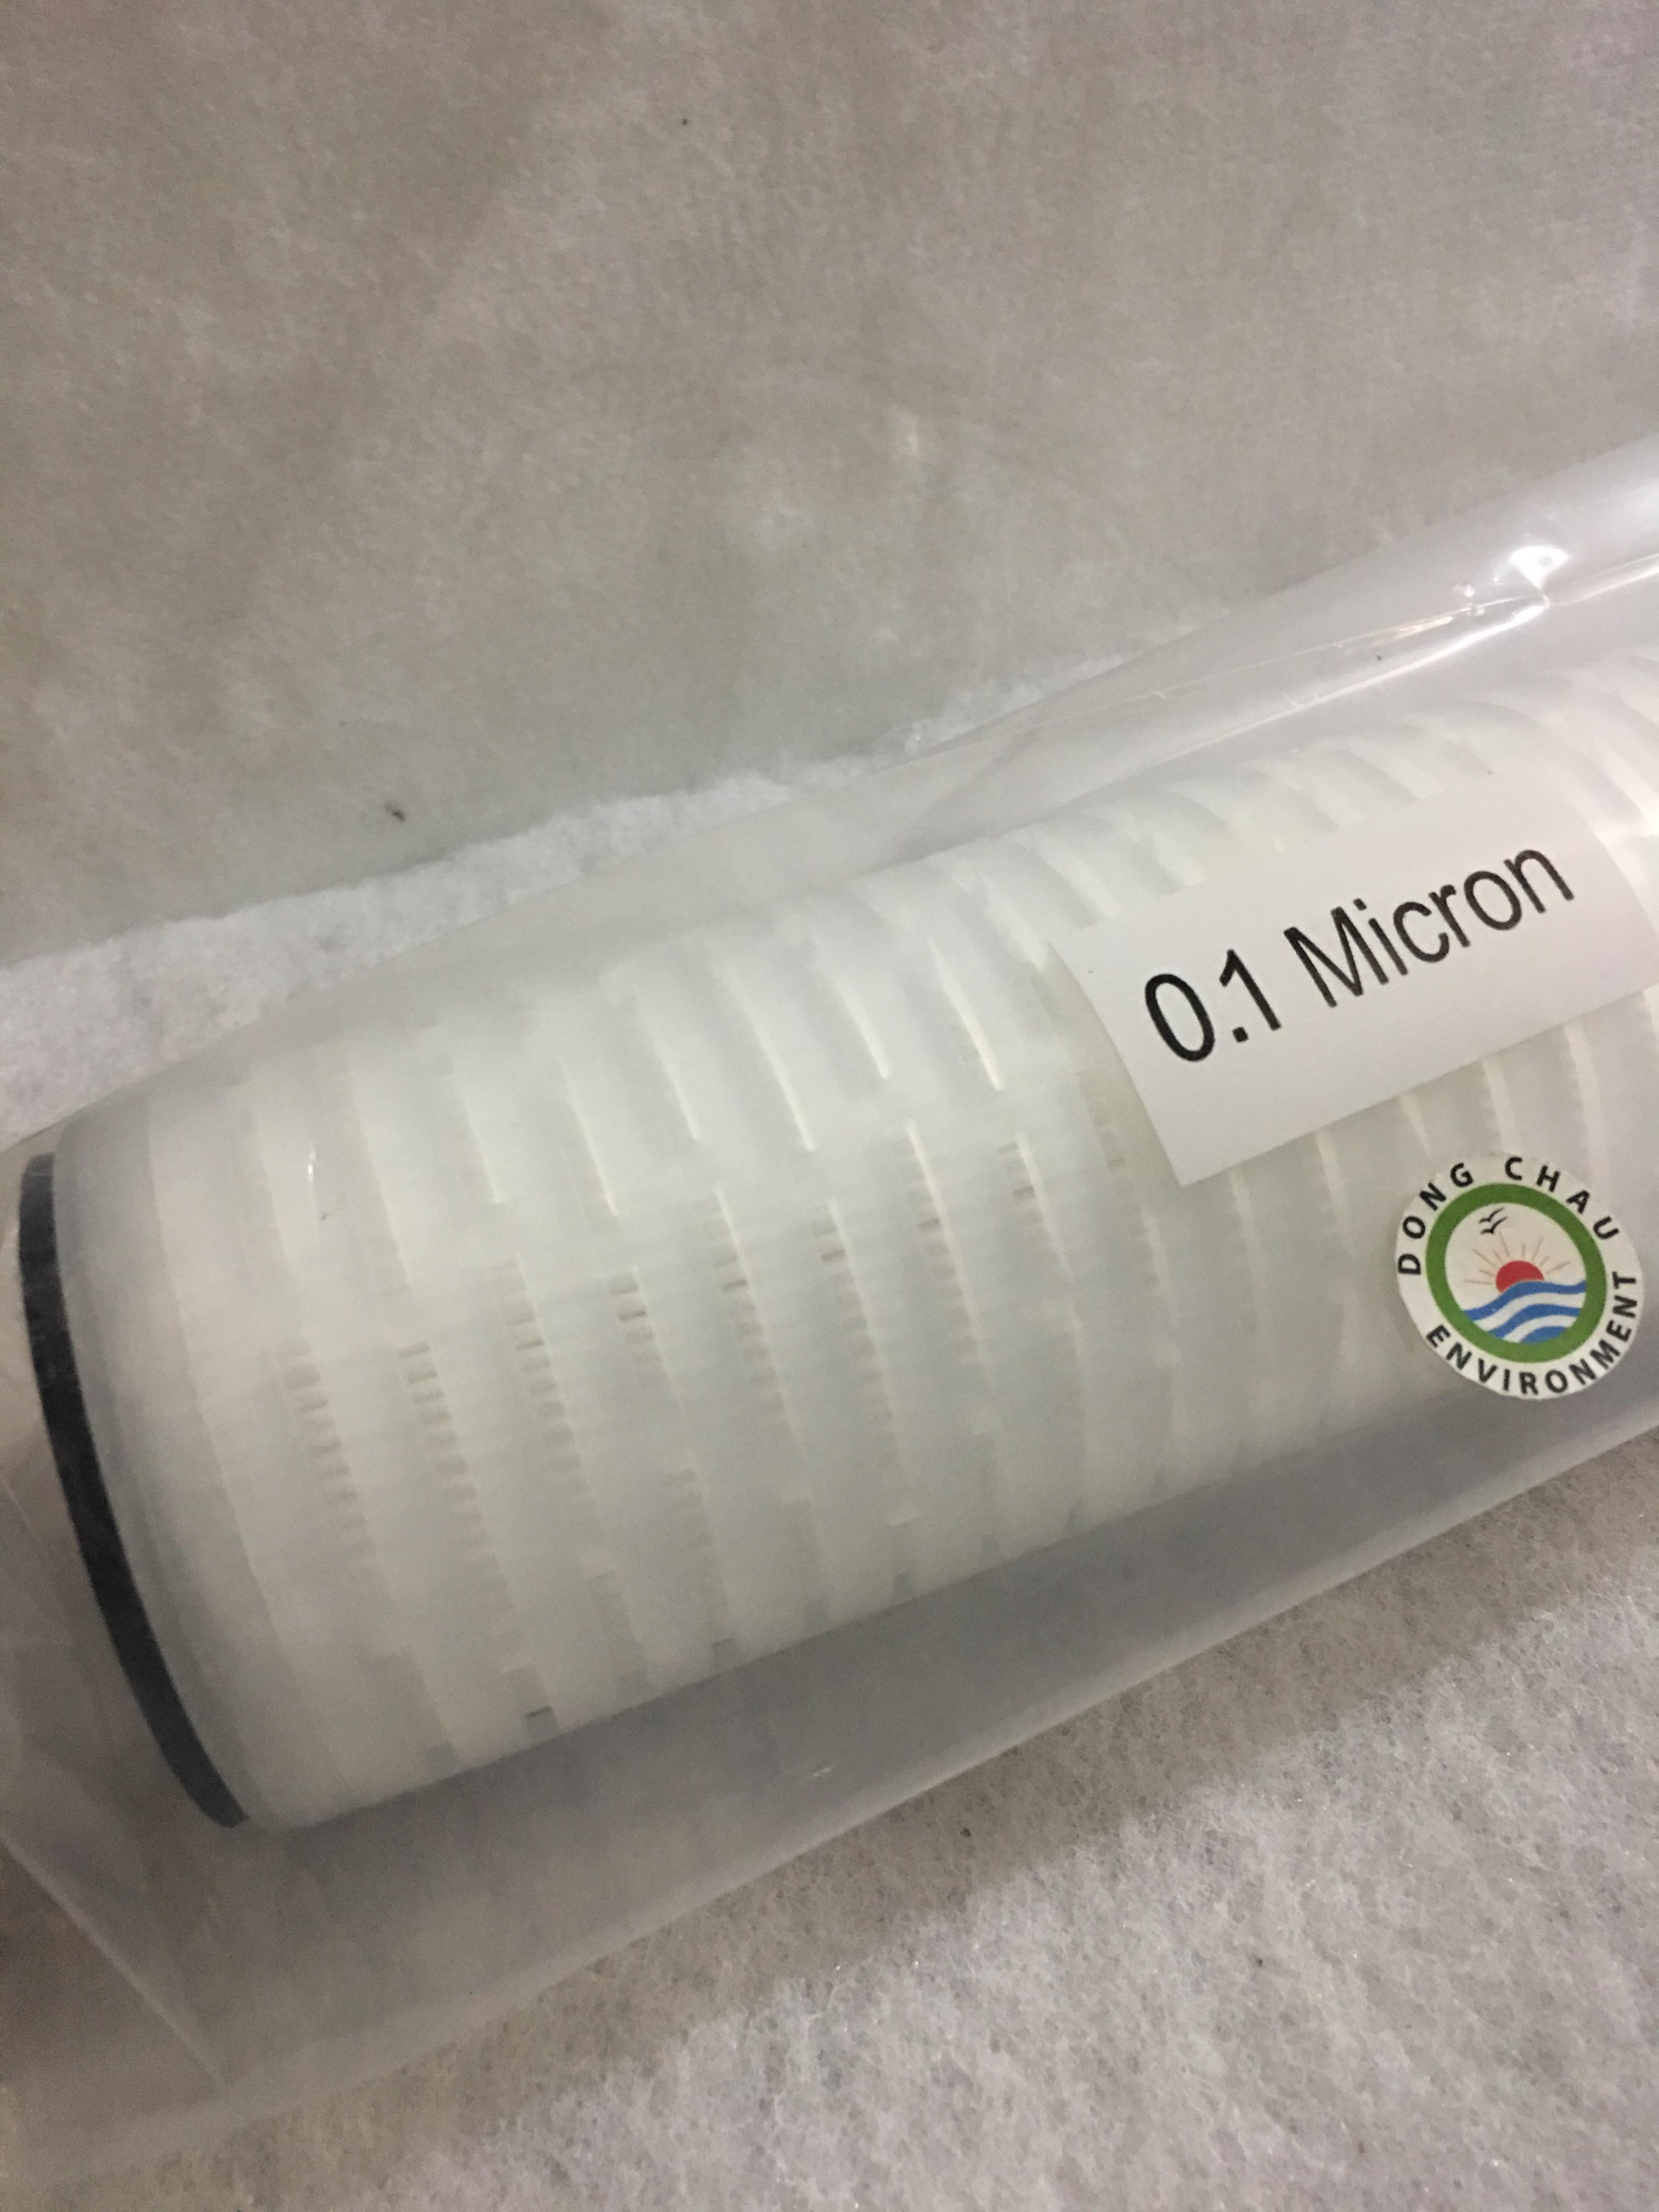 Lõi lọc giấy xếp 0.1 micron 10 inch DOE Clean Green